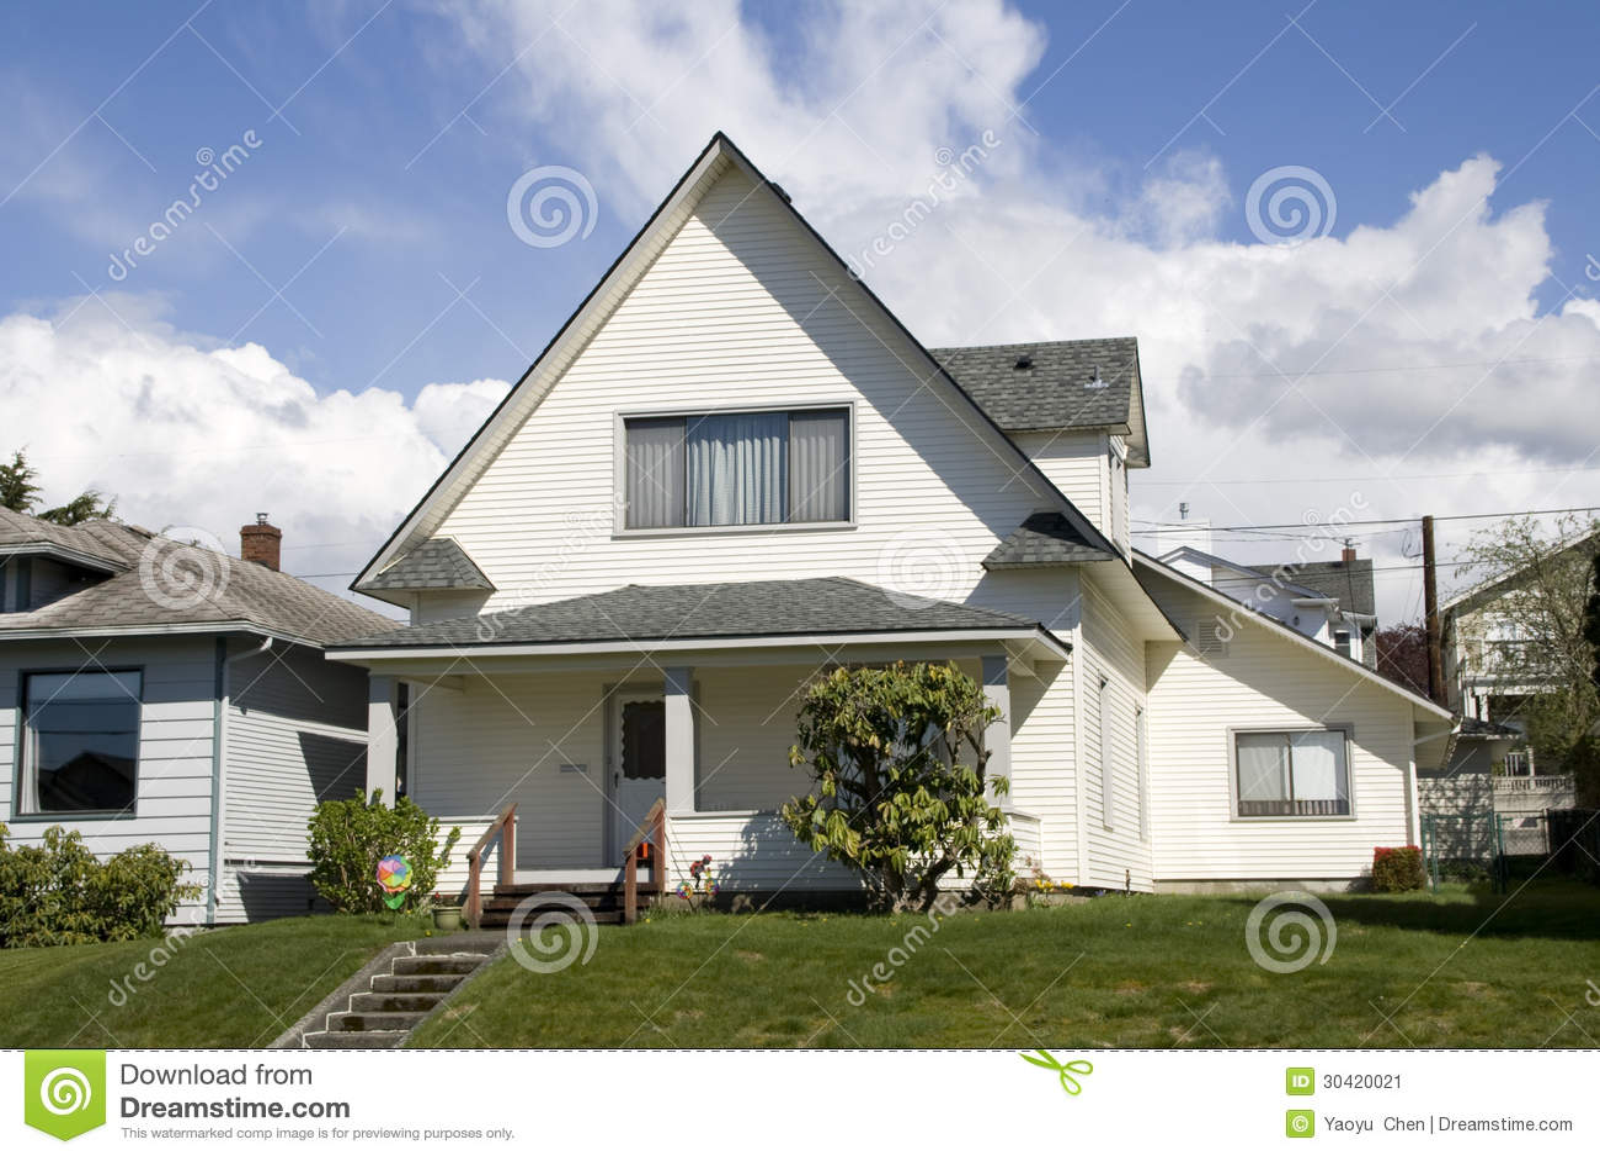 Uniek wit huis stock afbeelding afbeelding bestaande uit stairs 30420021 - Ontwerp buitenkant ontwerp ...